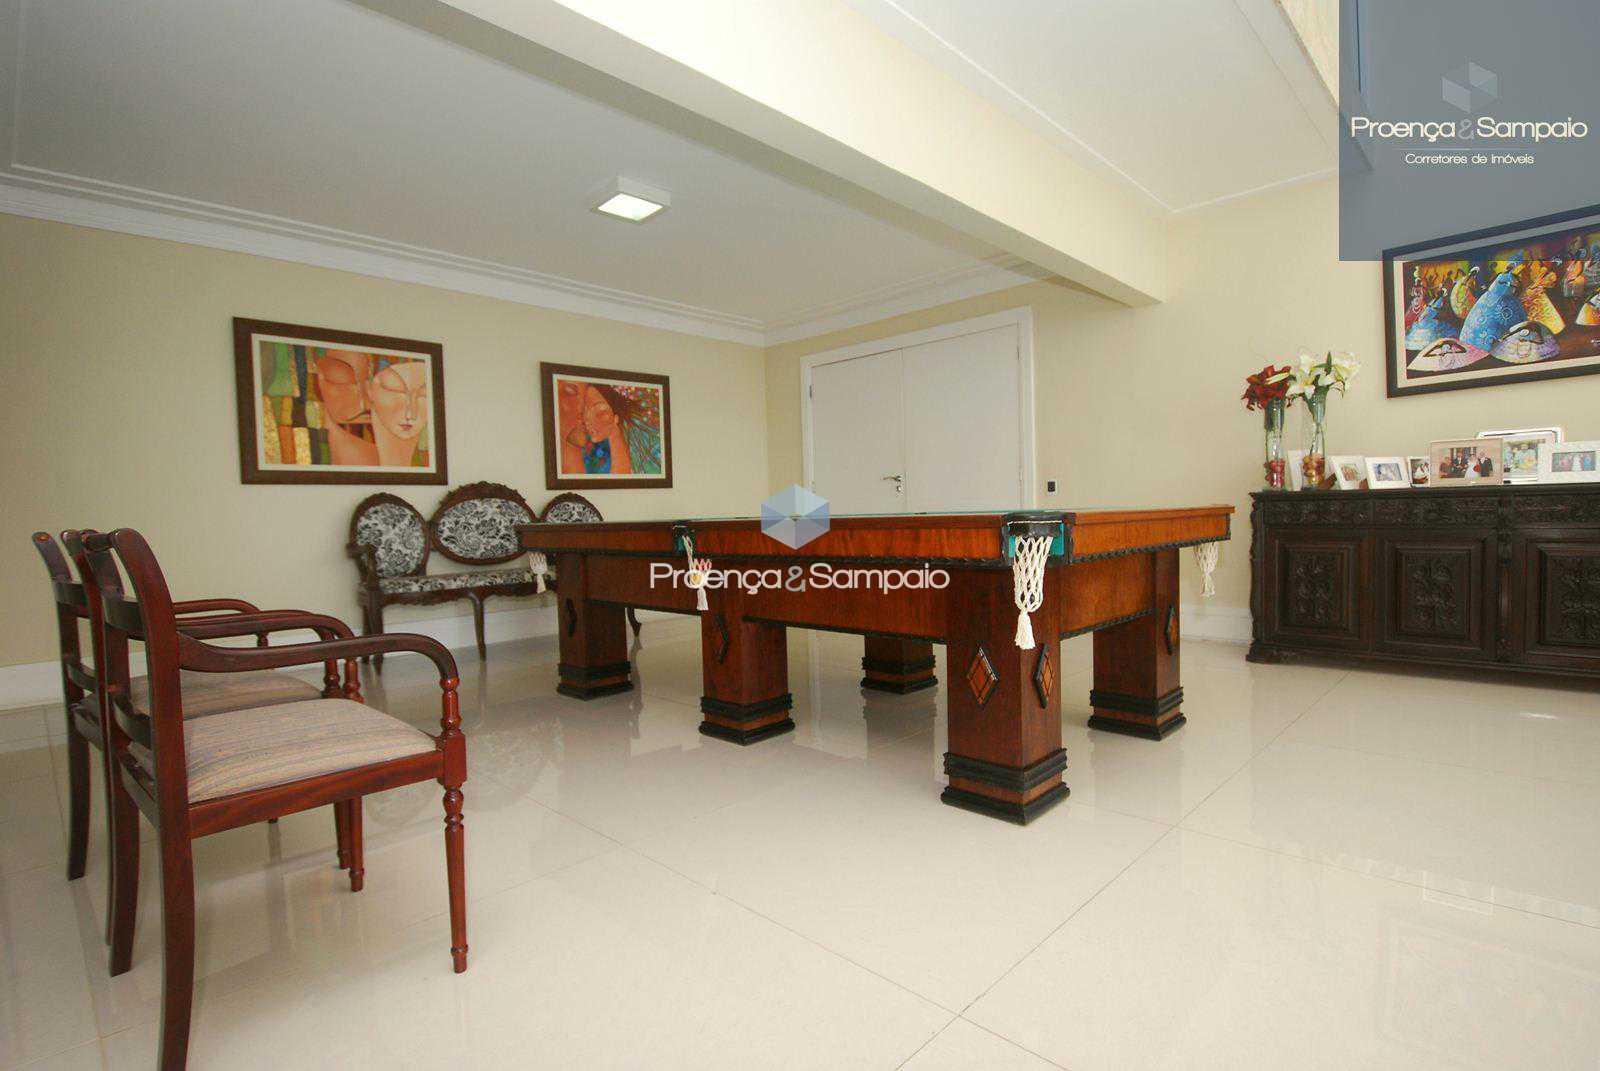 FOTO12 - Casa em Condomínio à venda Avenida Santos Dumont,Lauro de Freitas,BA - R$ 7.000.000 - PSCN50005 - 14